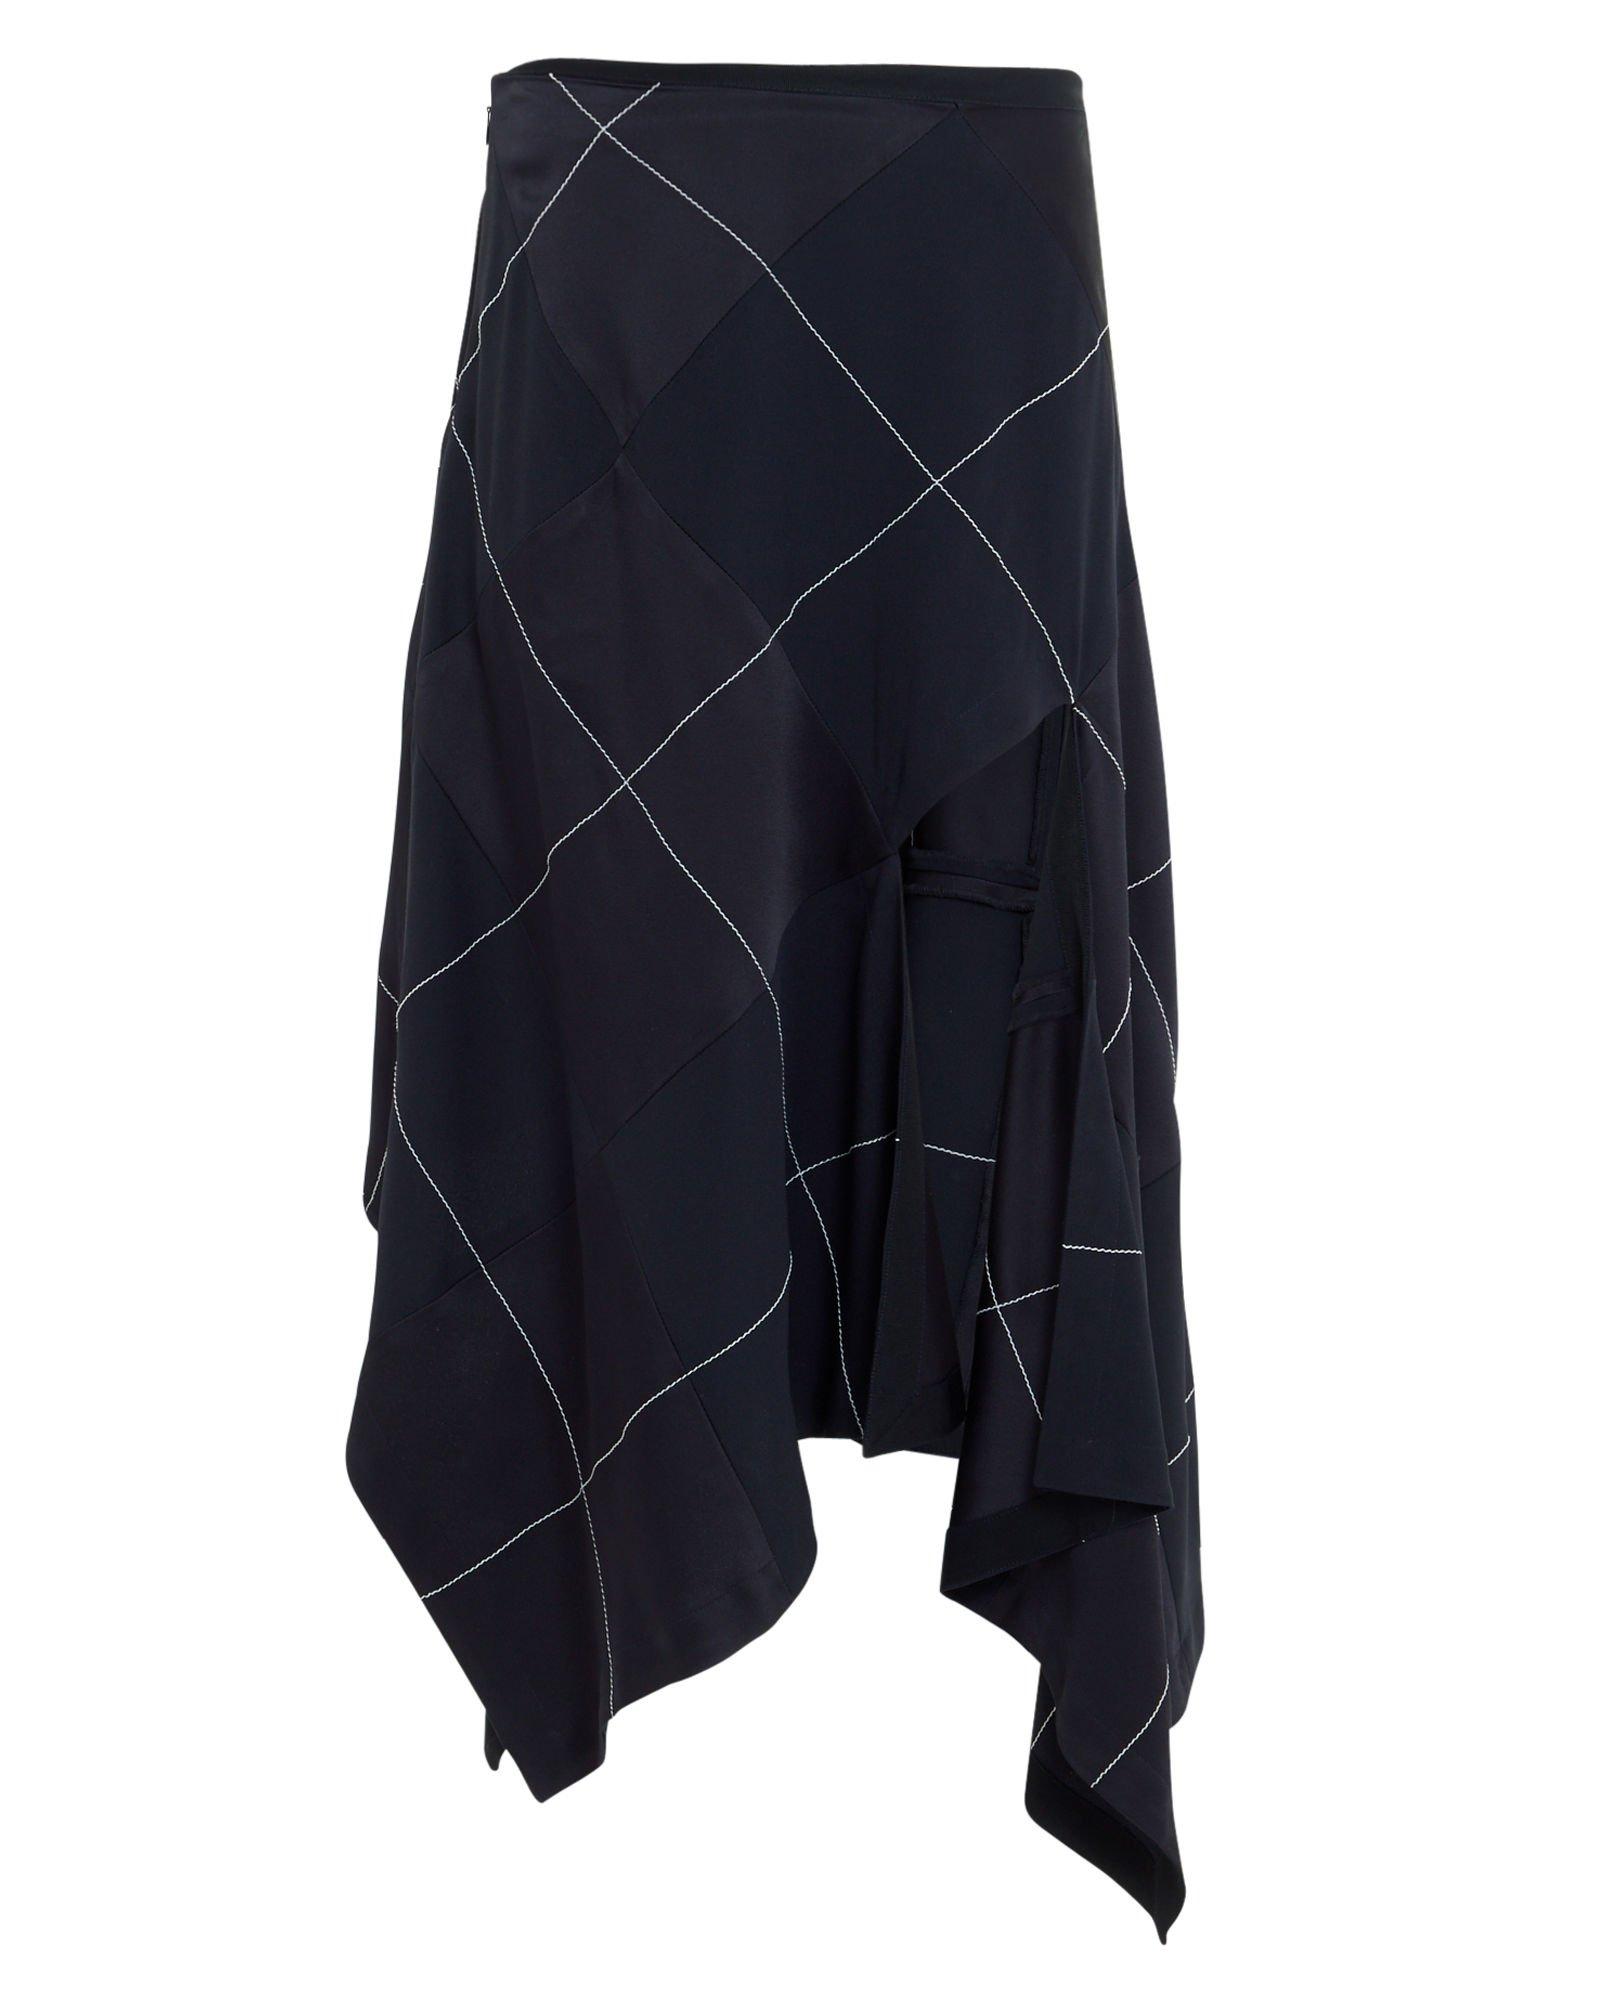 Argyle Asymmetrical Skirt